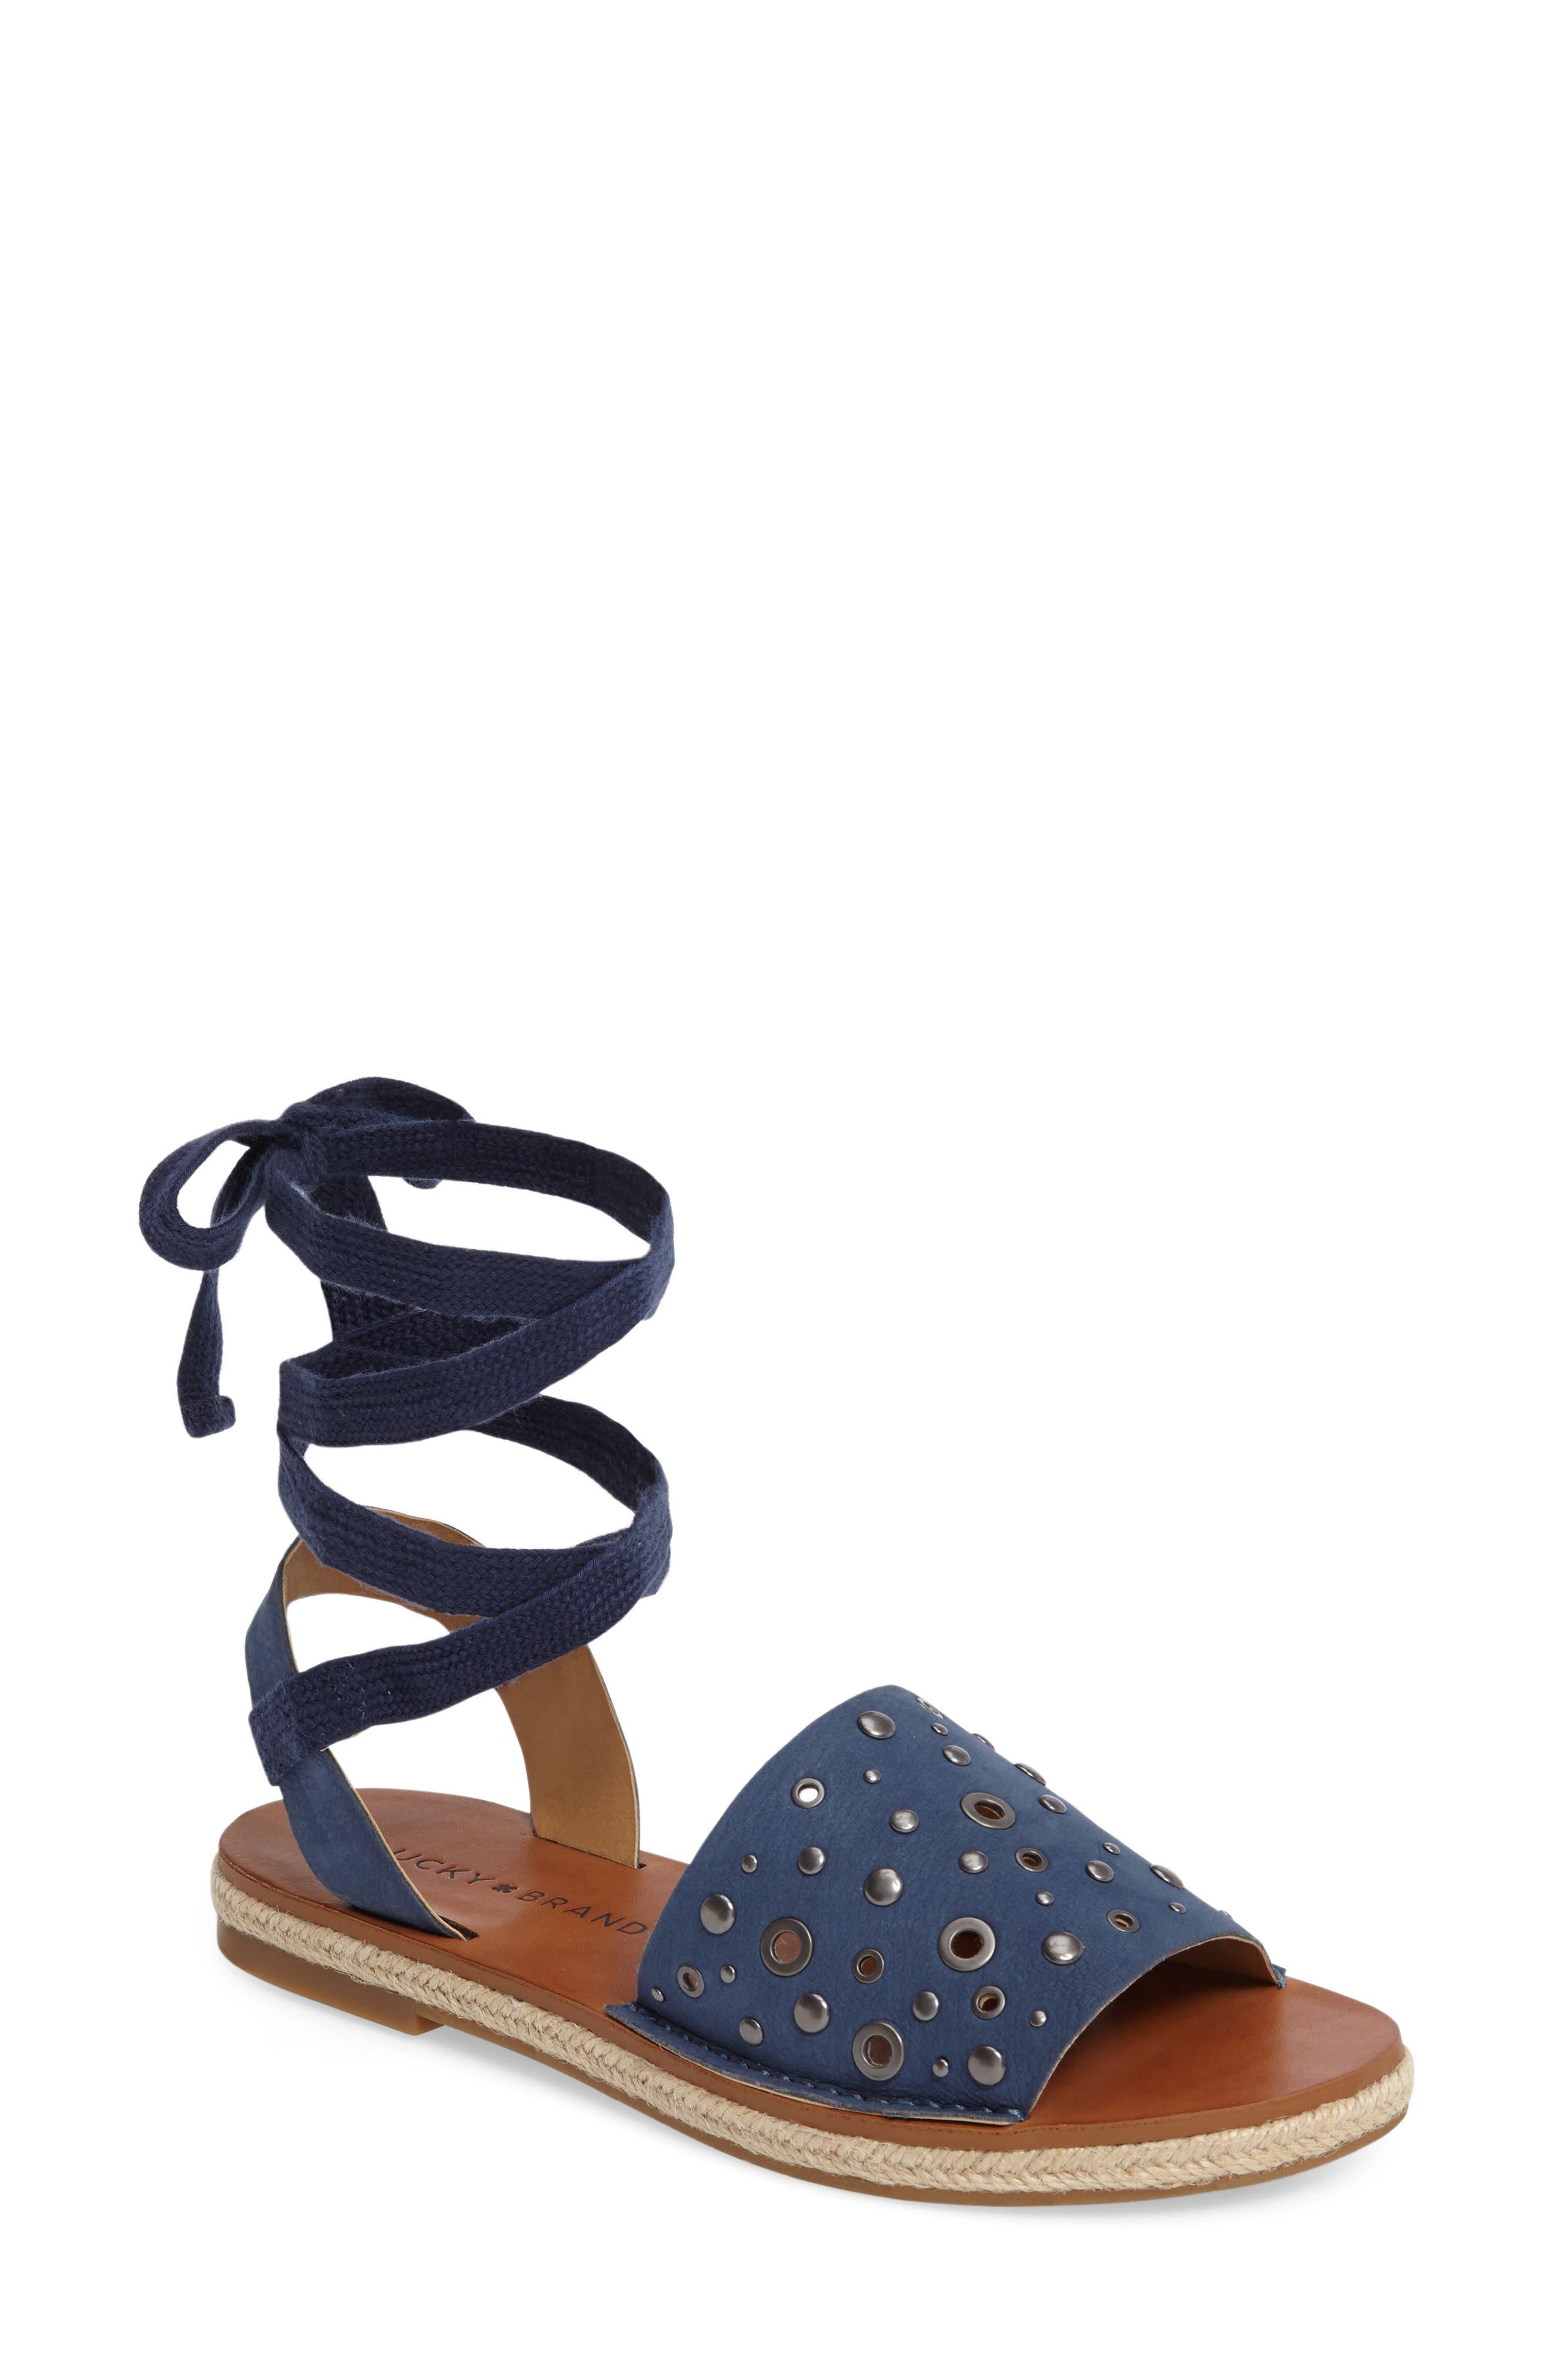 Daytah Ankle Tie Sandal,                         Main,                         color, Dark Chambray